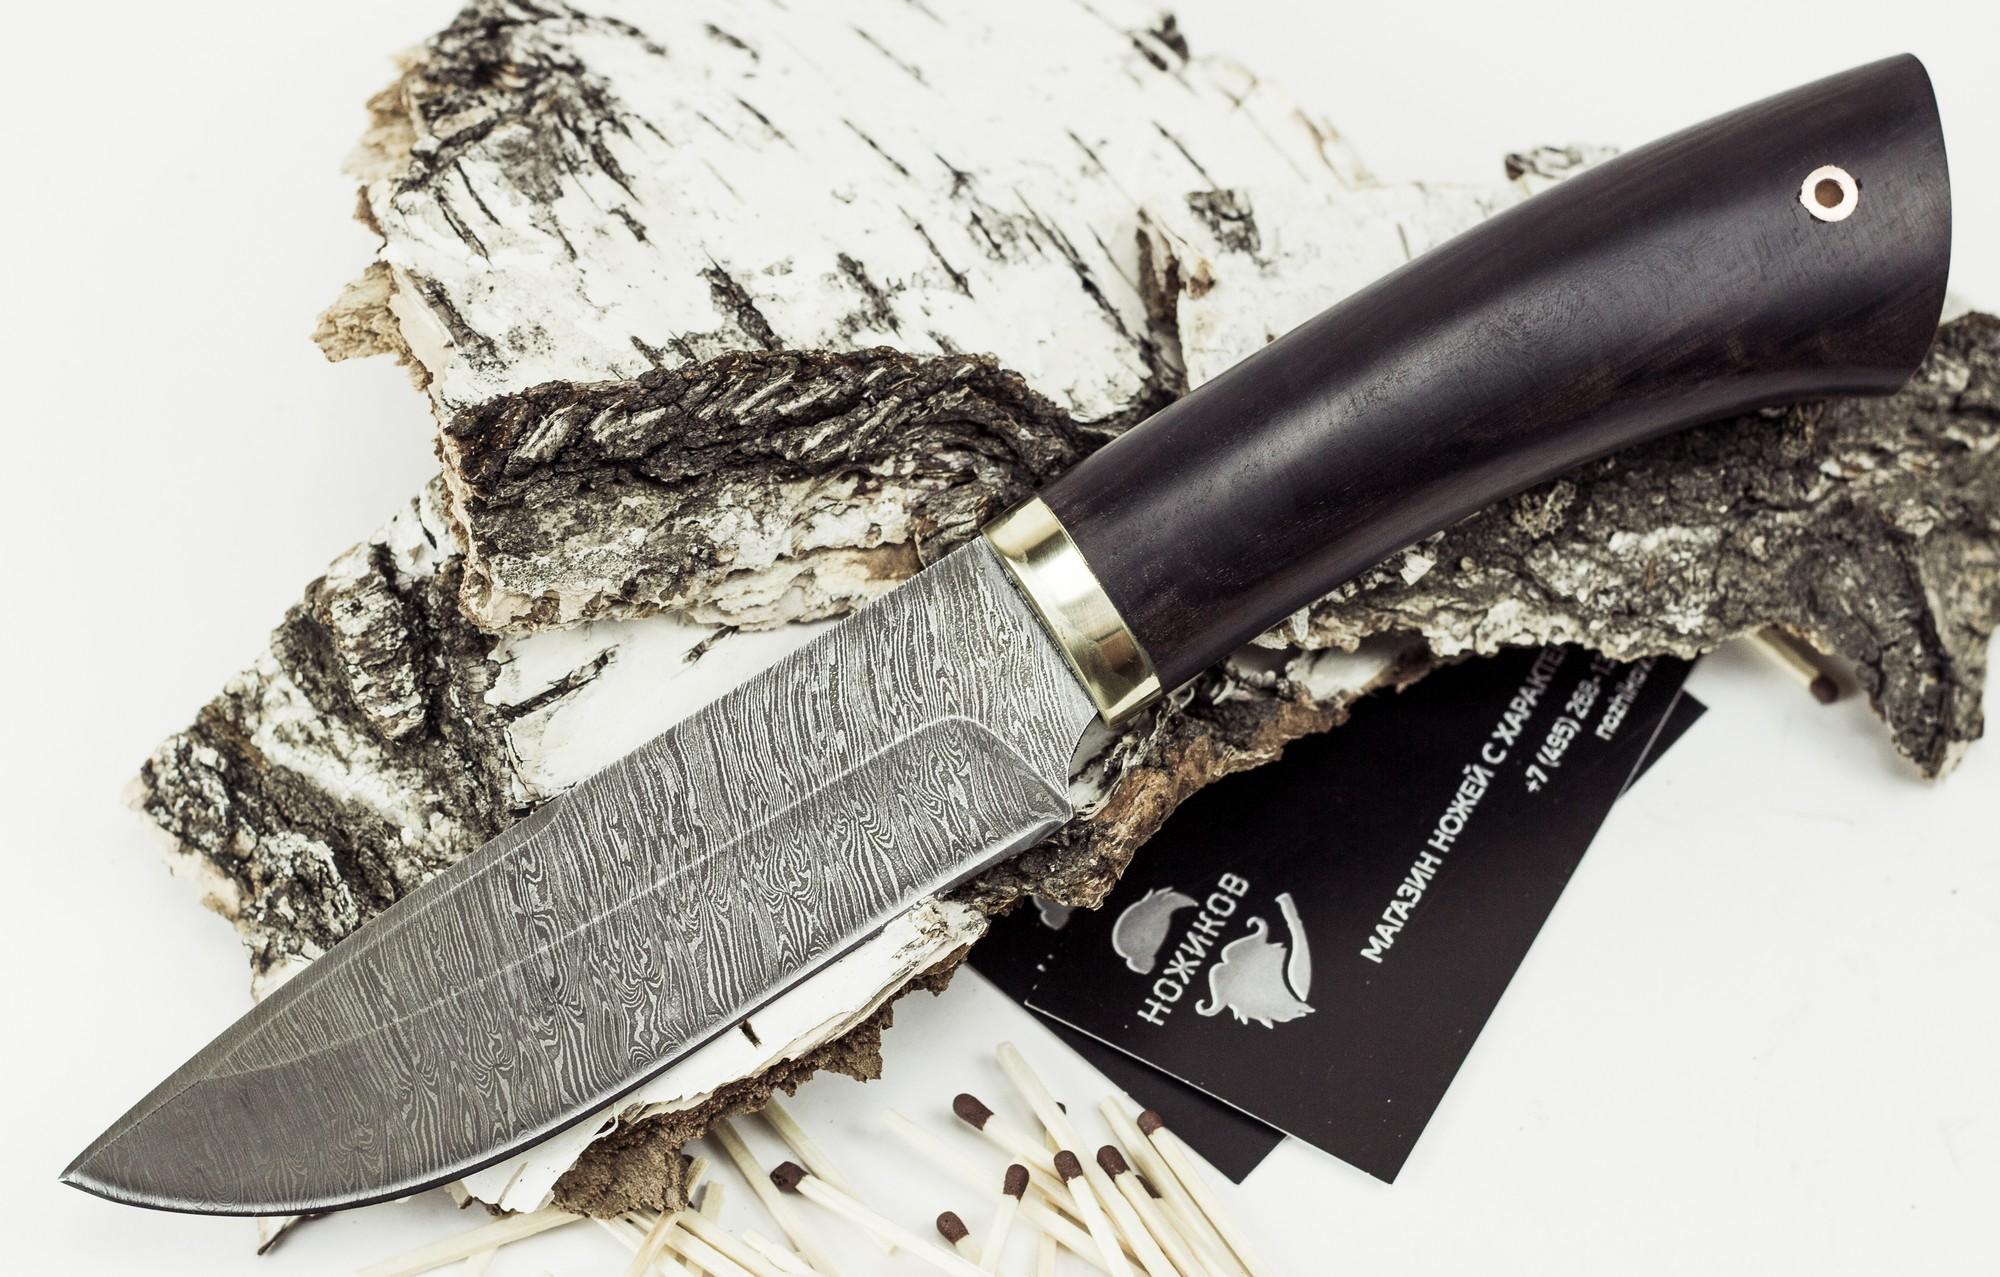 Нож Старатель, дамасская стальНожи Ворсма<br>Нож Старатель, дамасская сталь<br>